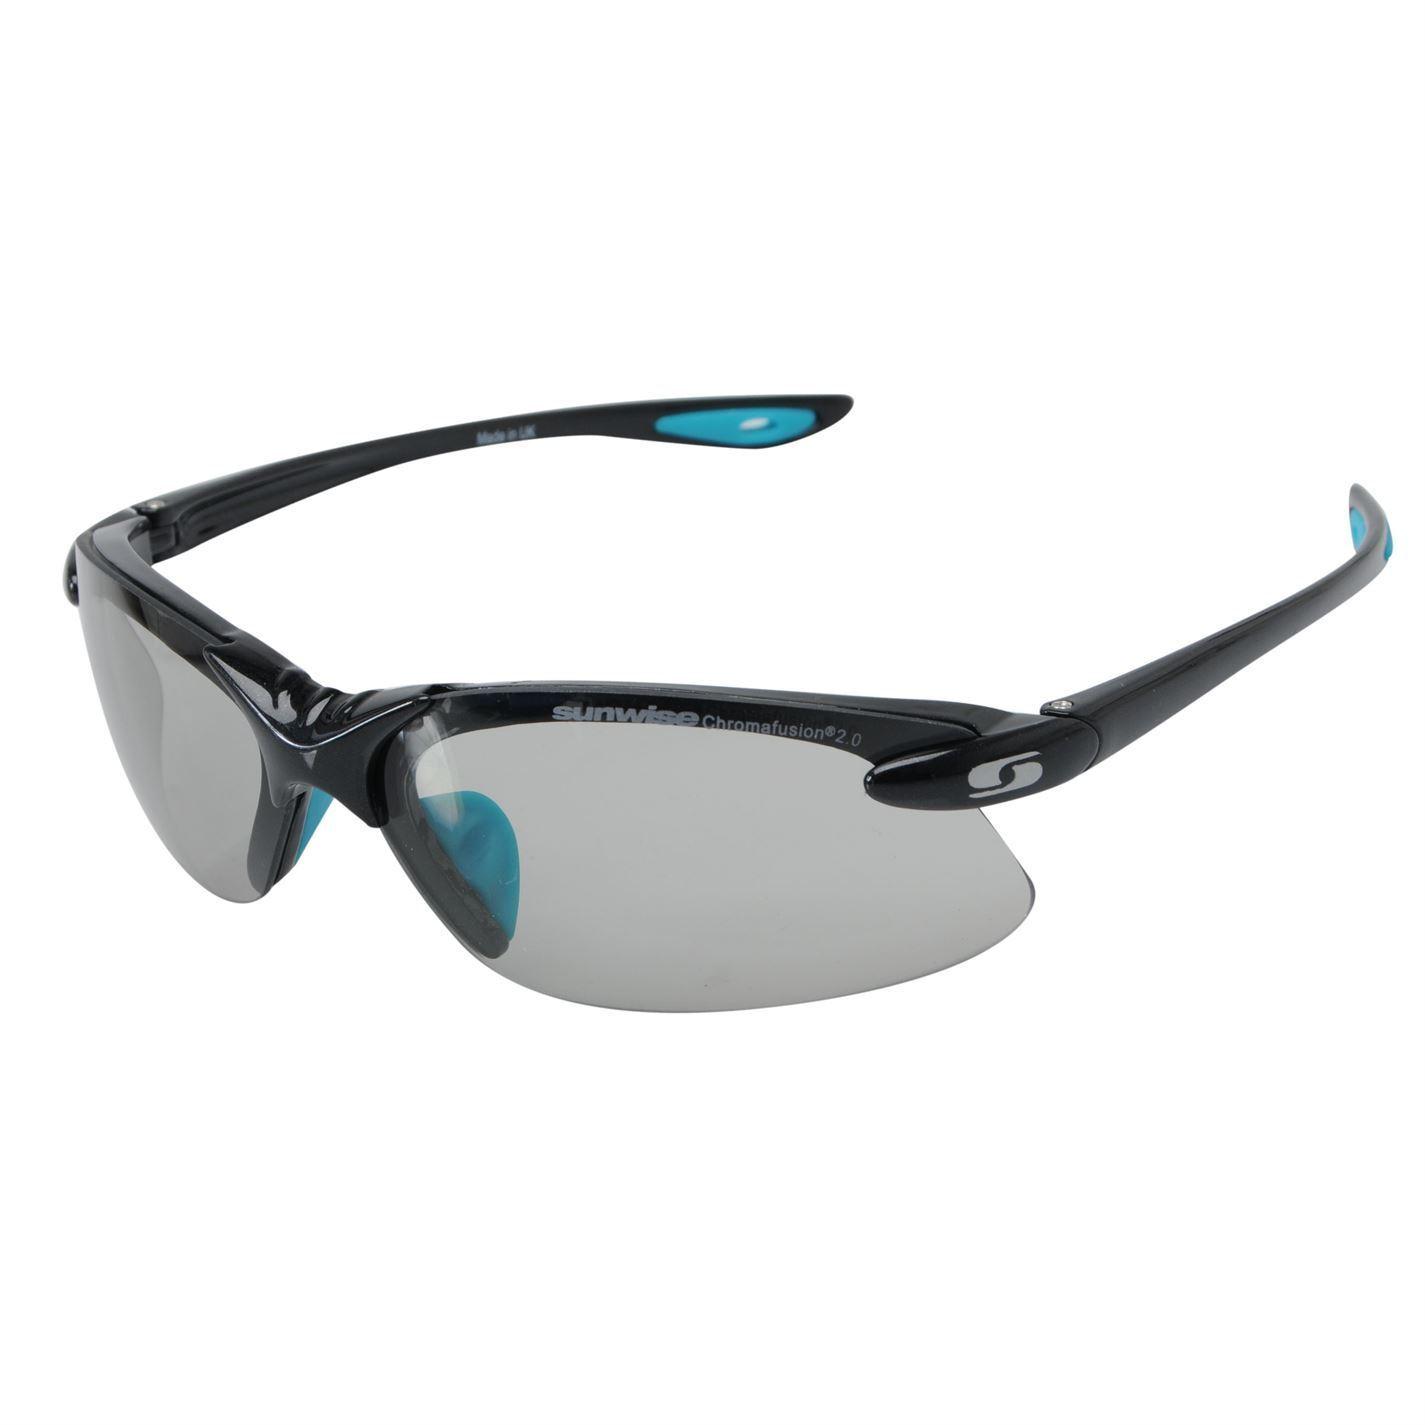 Sunwise WATERLOO Sports Sunglasses Polarised Cycle Running Triathlon sunglasses